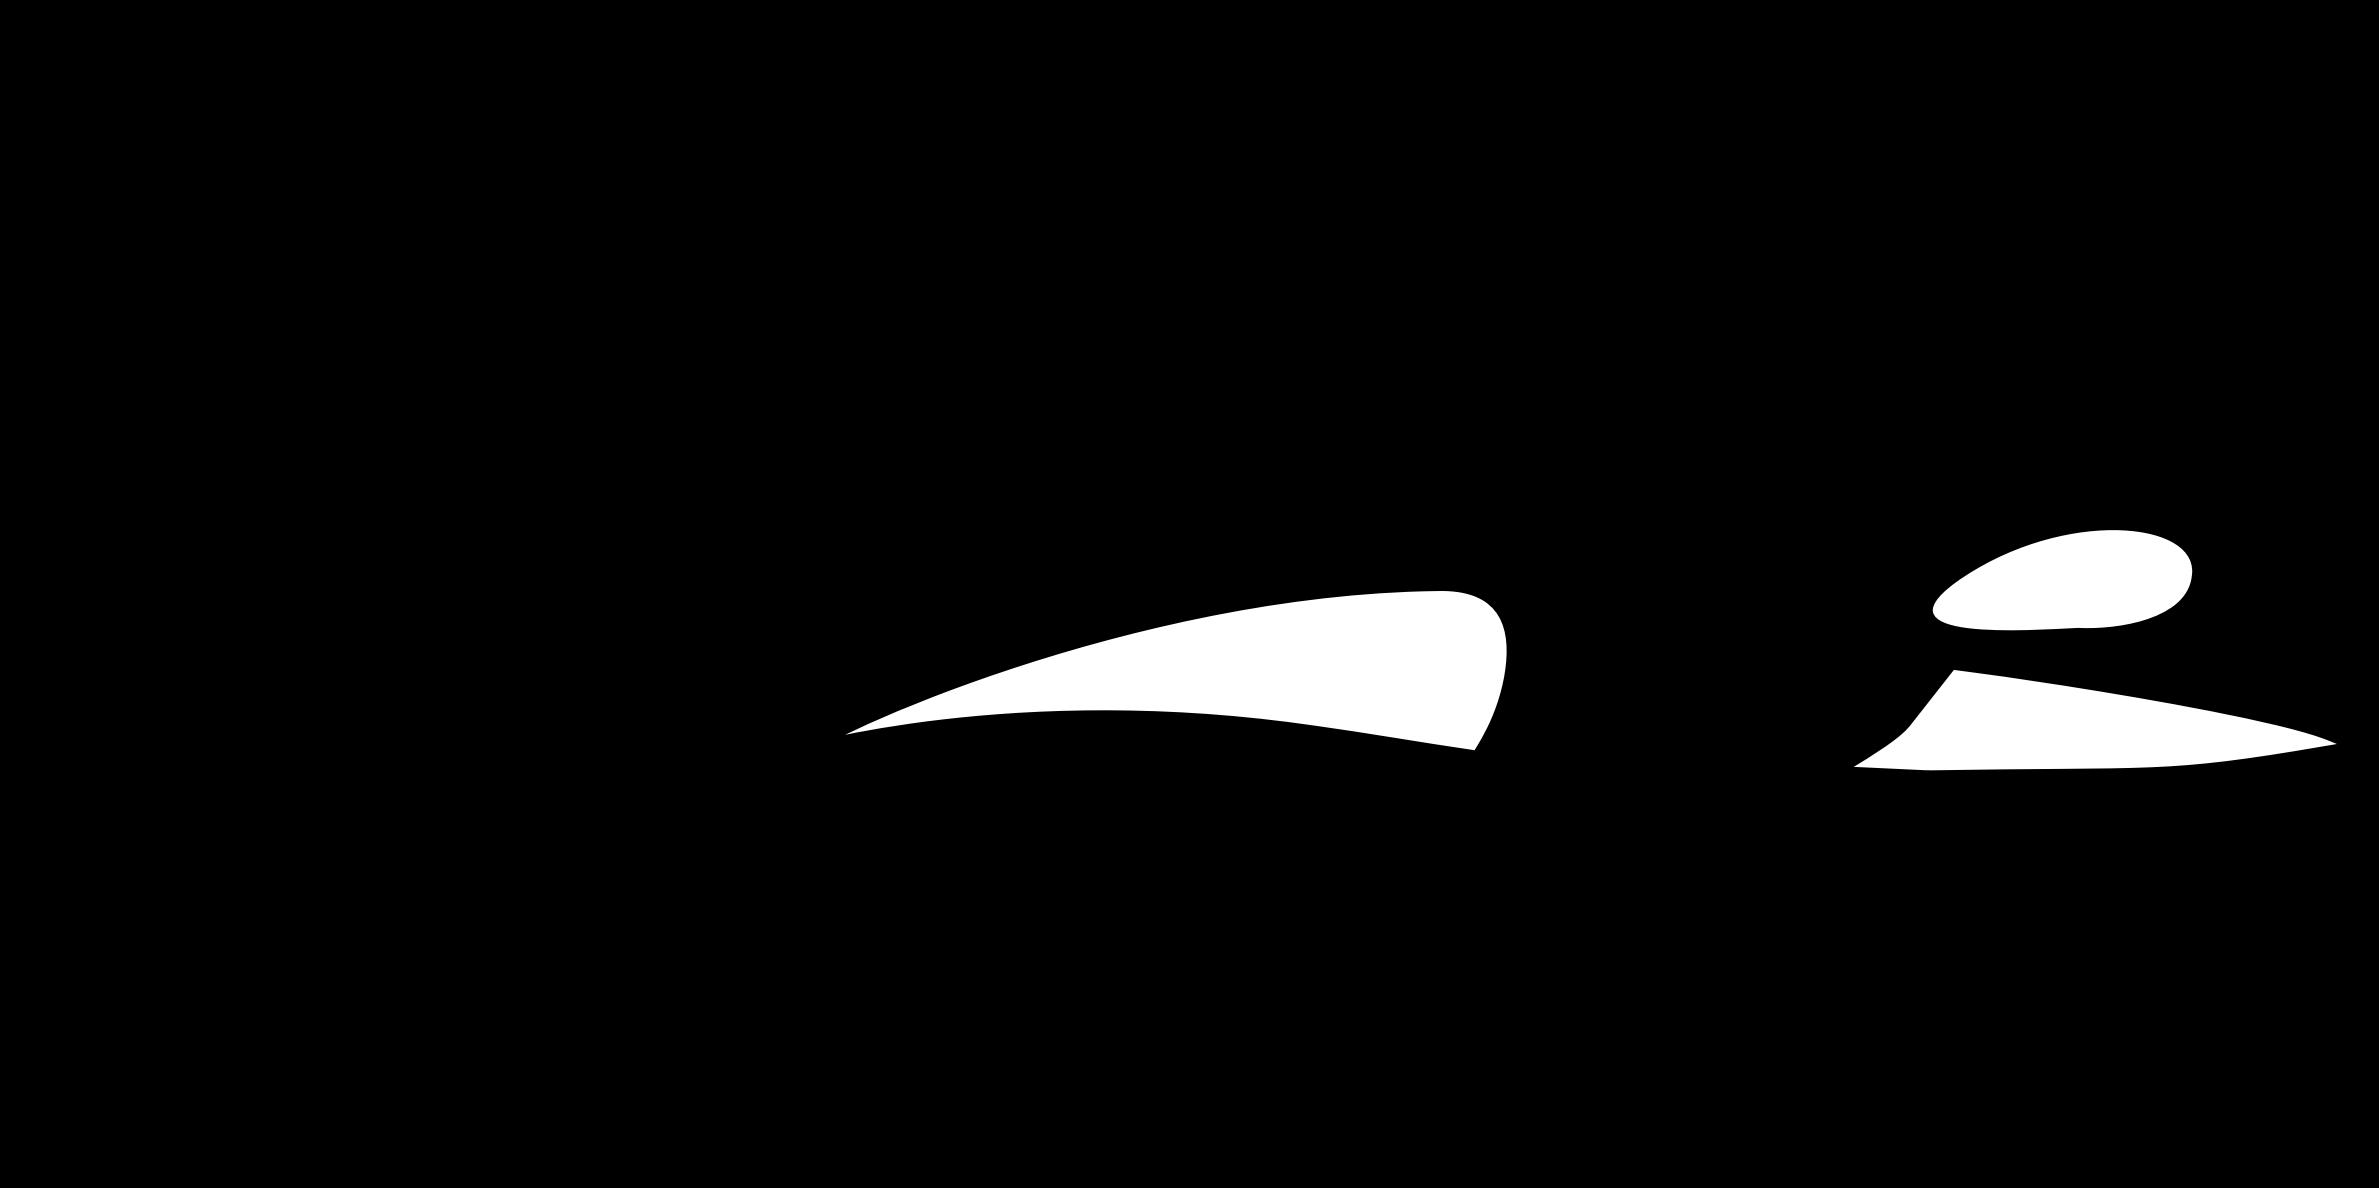 orca-clipart-6.png